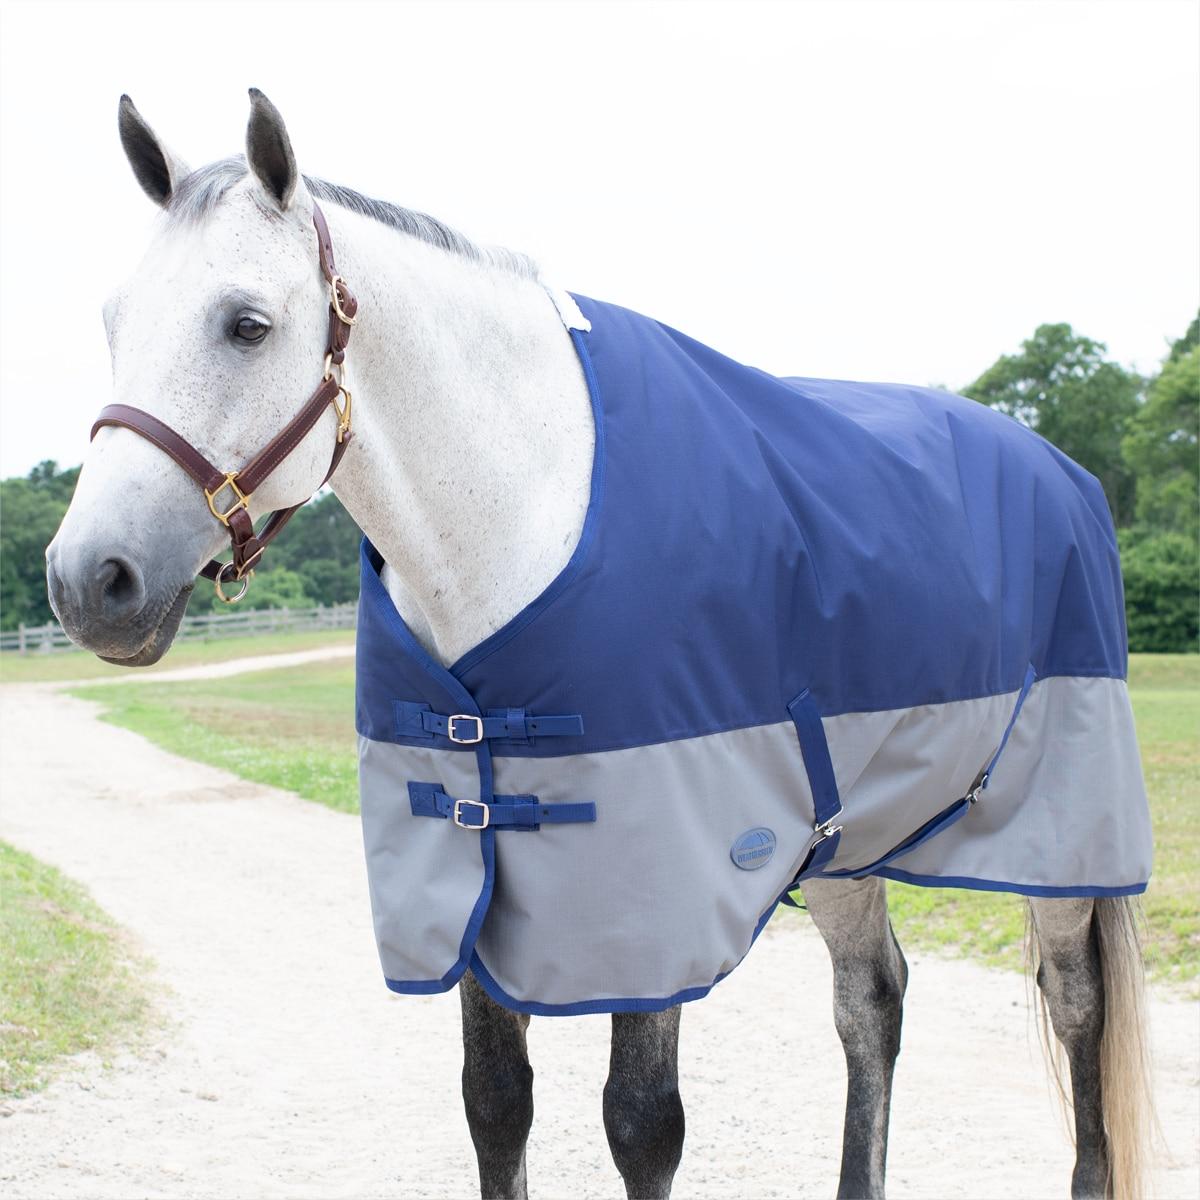 Cwell Equine New LightWeight Black turnout rug Blanket rain sheet no fill 600 Denier waterproof /… 69